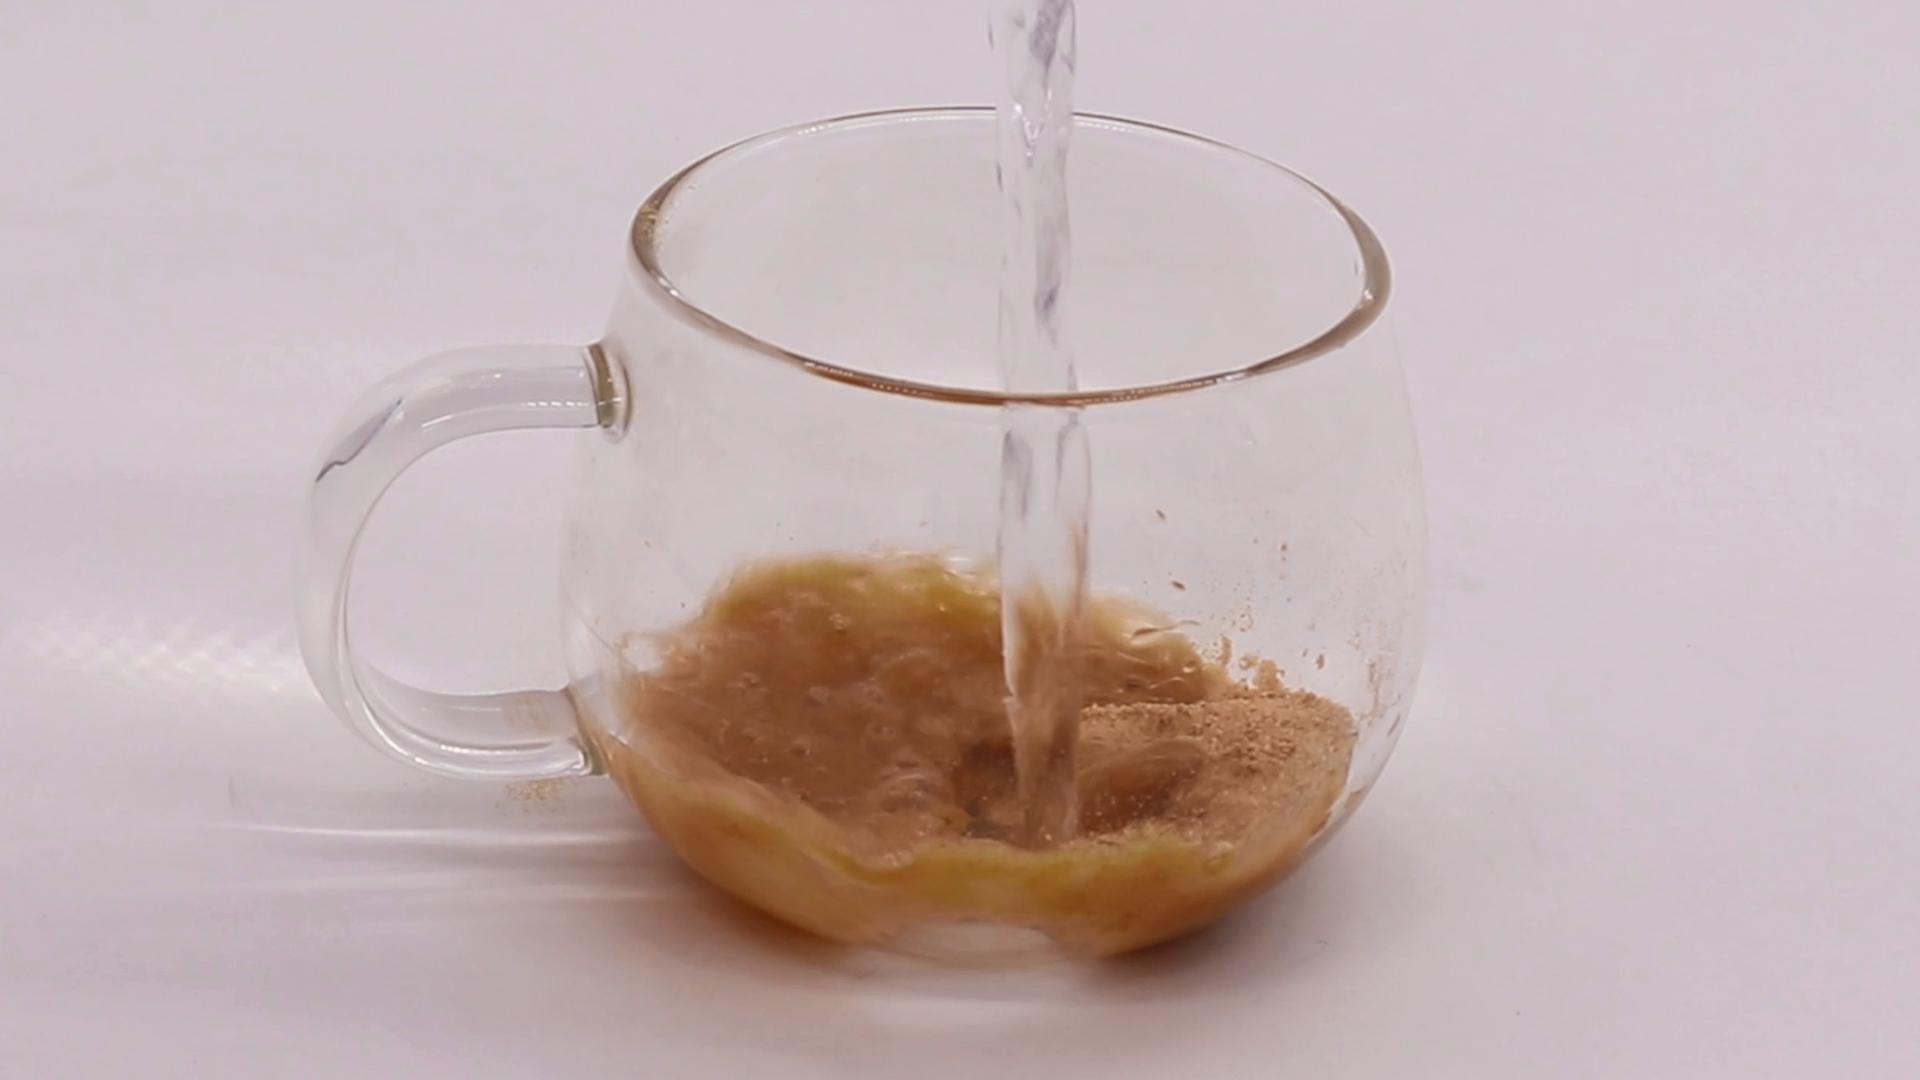 Menyediakan Minuman Energi Suplemen Protein Tanaman Protein Tanaman Sumber Protein Tanaman Murni Minuman Padat